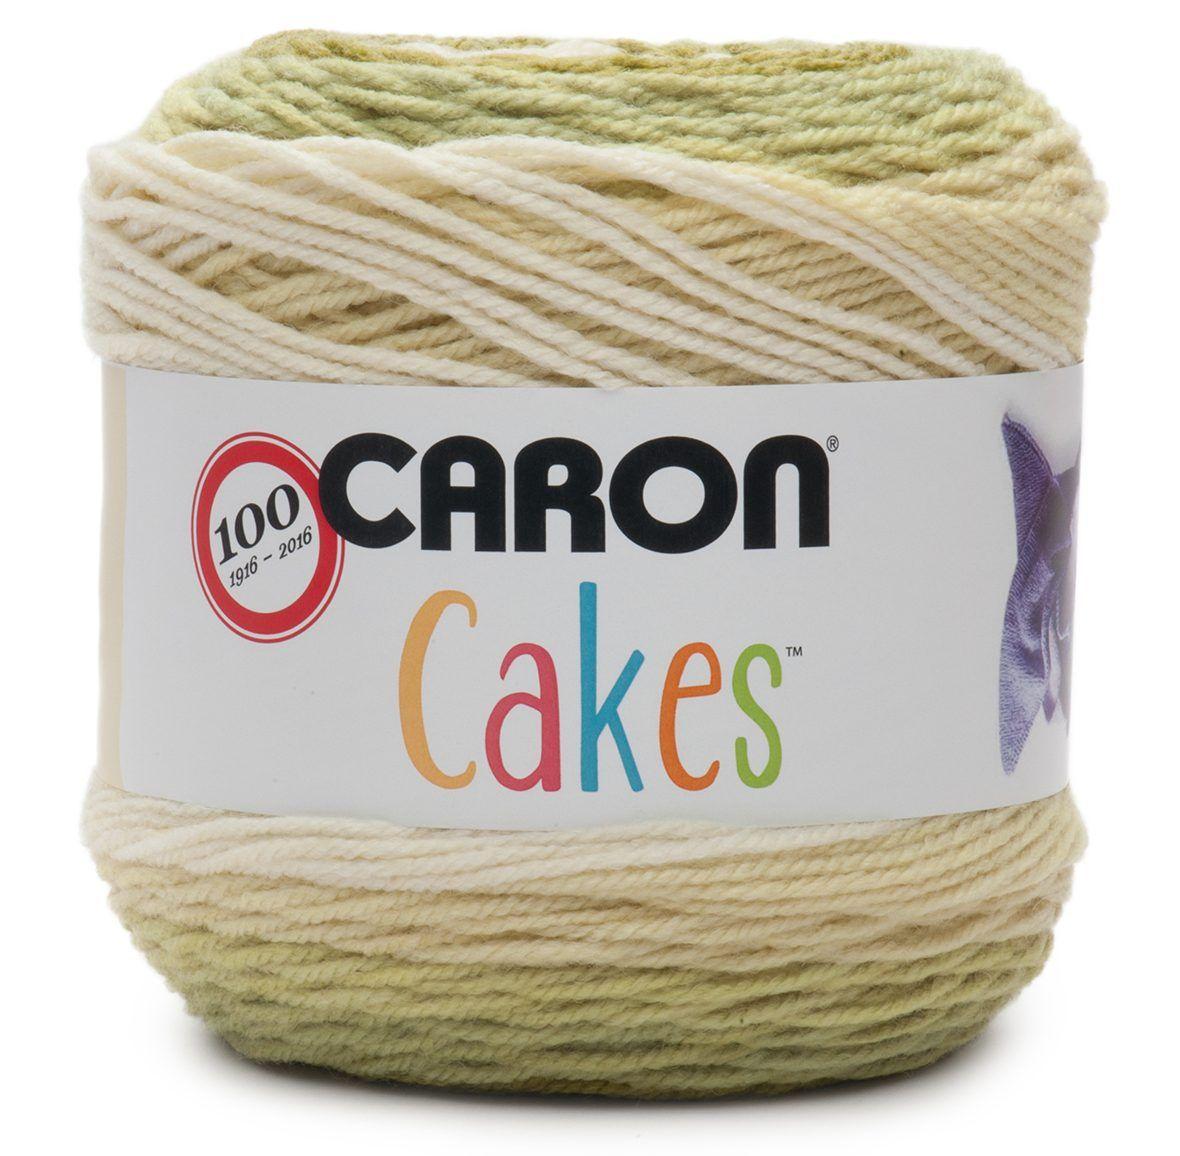 Free Crochet Patterns Featuring Caron Cakes Yarn | Patrones ...